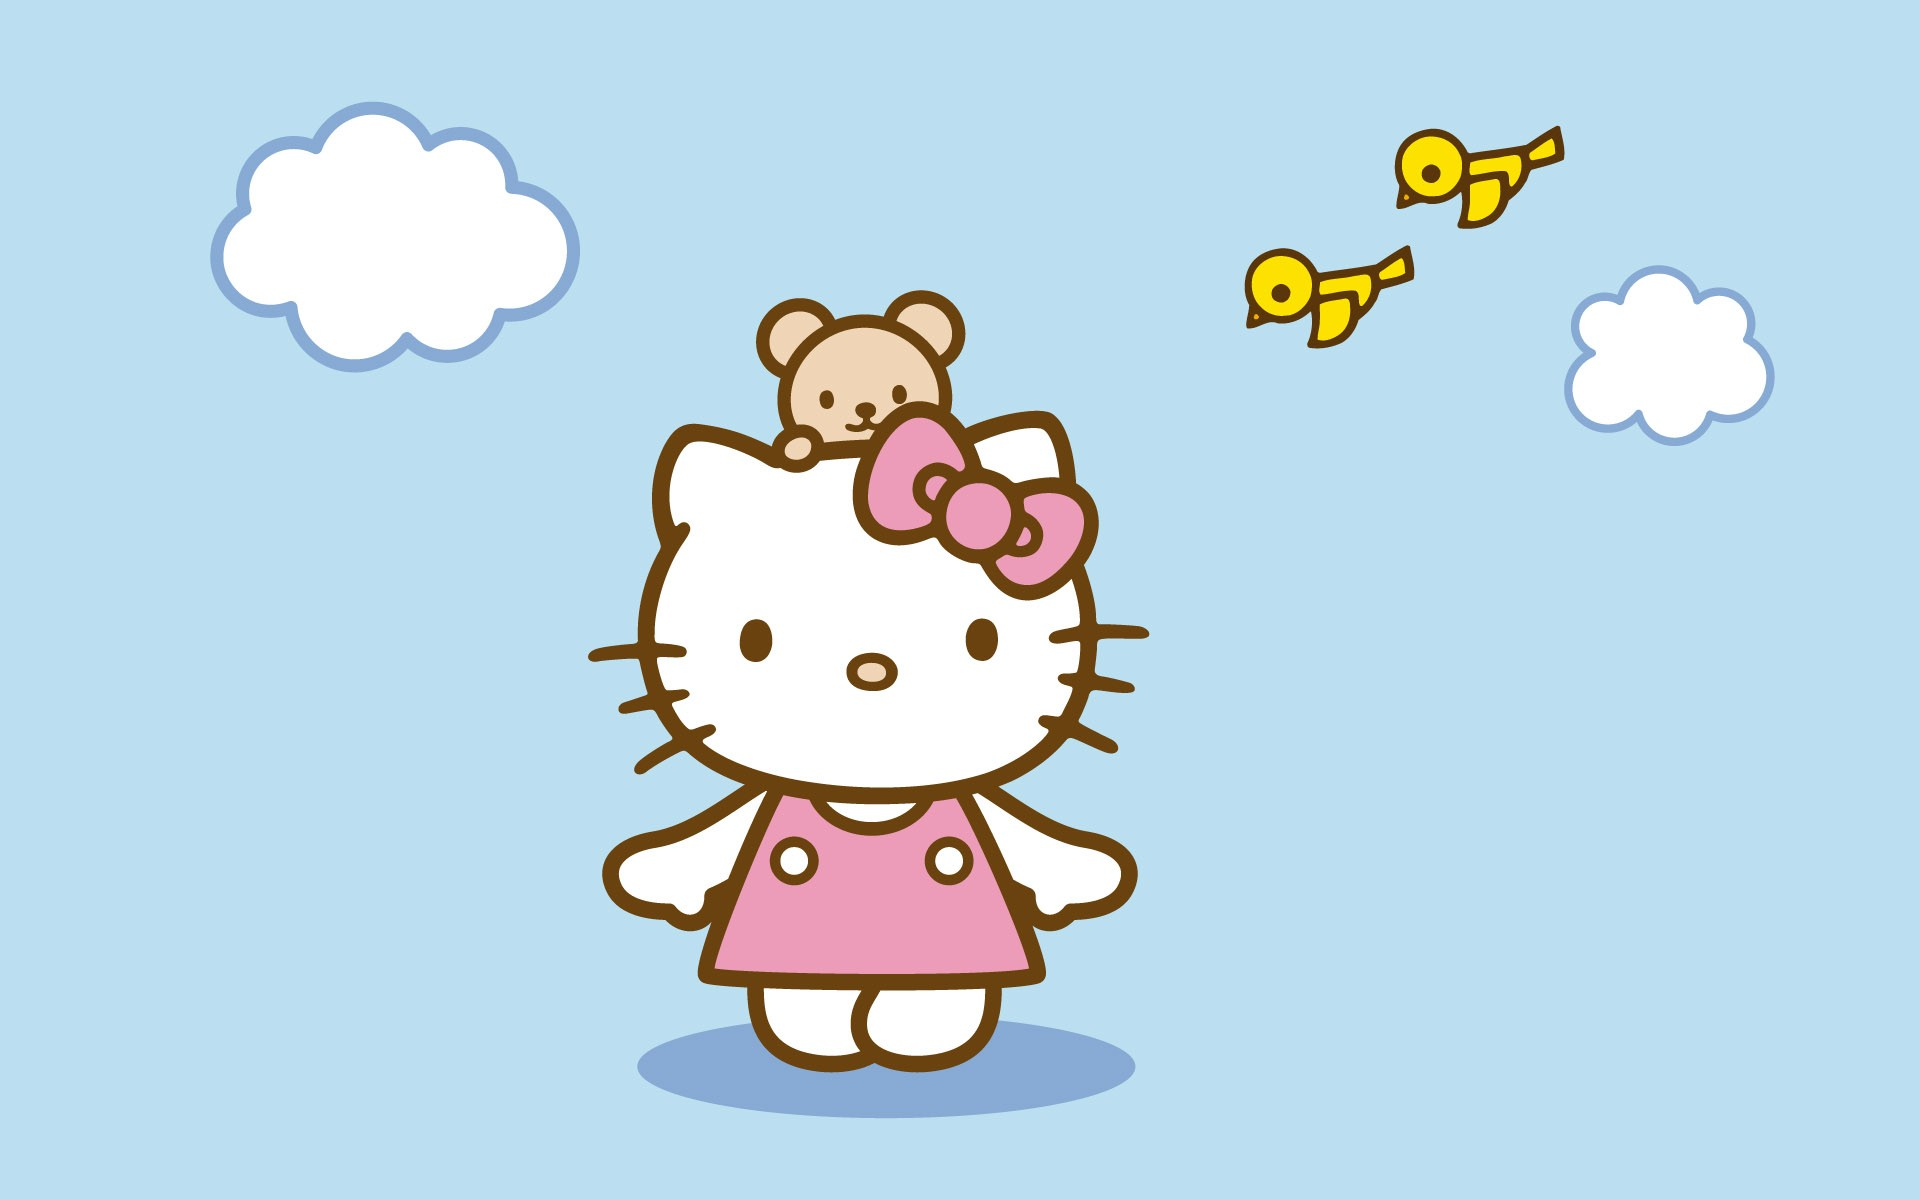 Best Wallpaper Hello Kitty Mint Green - 132081-hello-kitty-background-1920x1200-for-meizu  2018_8626100.jpg